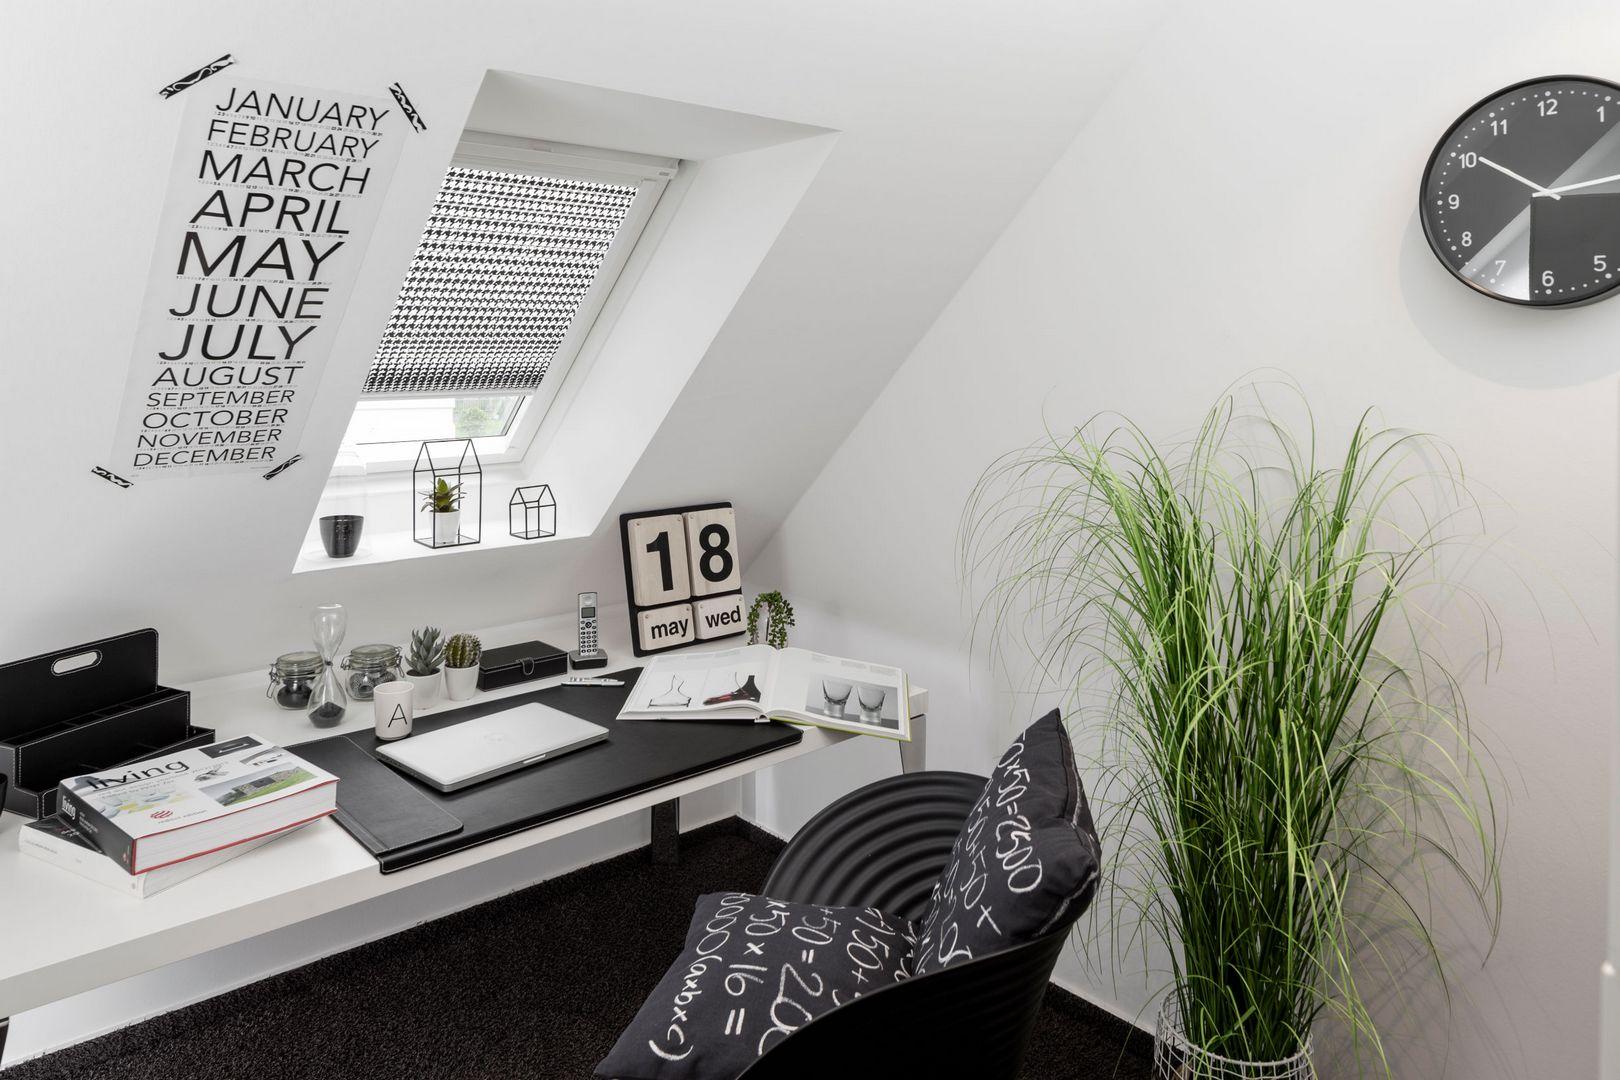 teba plissee sonnenschutz mg michael galli dachfenster gmbh. Black Bedroom Furniture Sets. Home Design Ideas